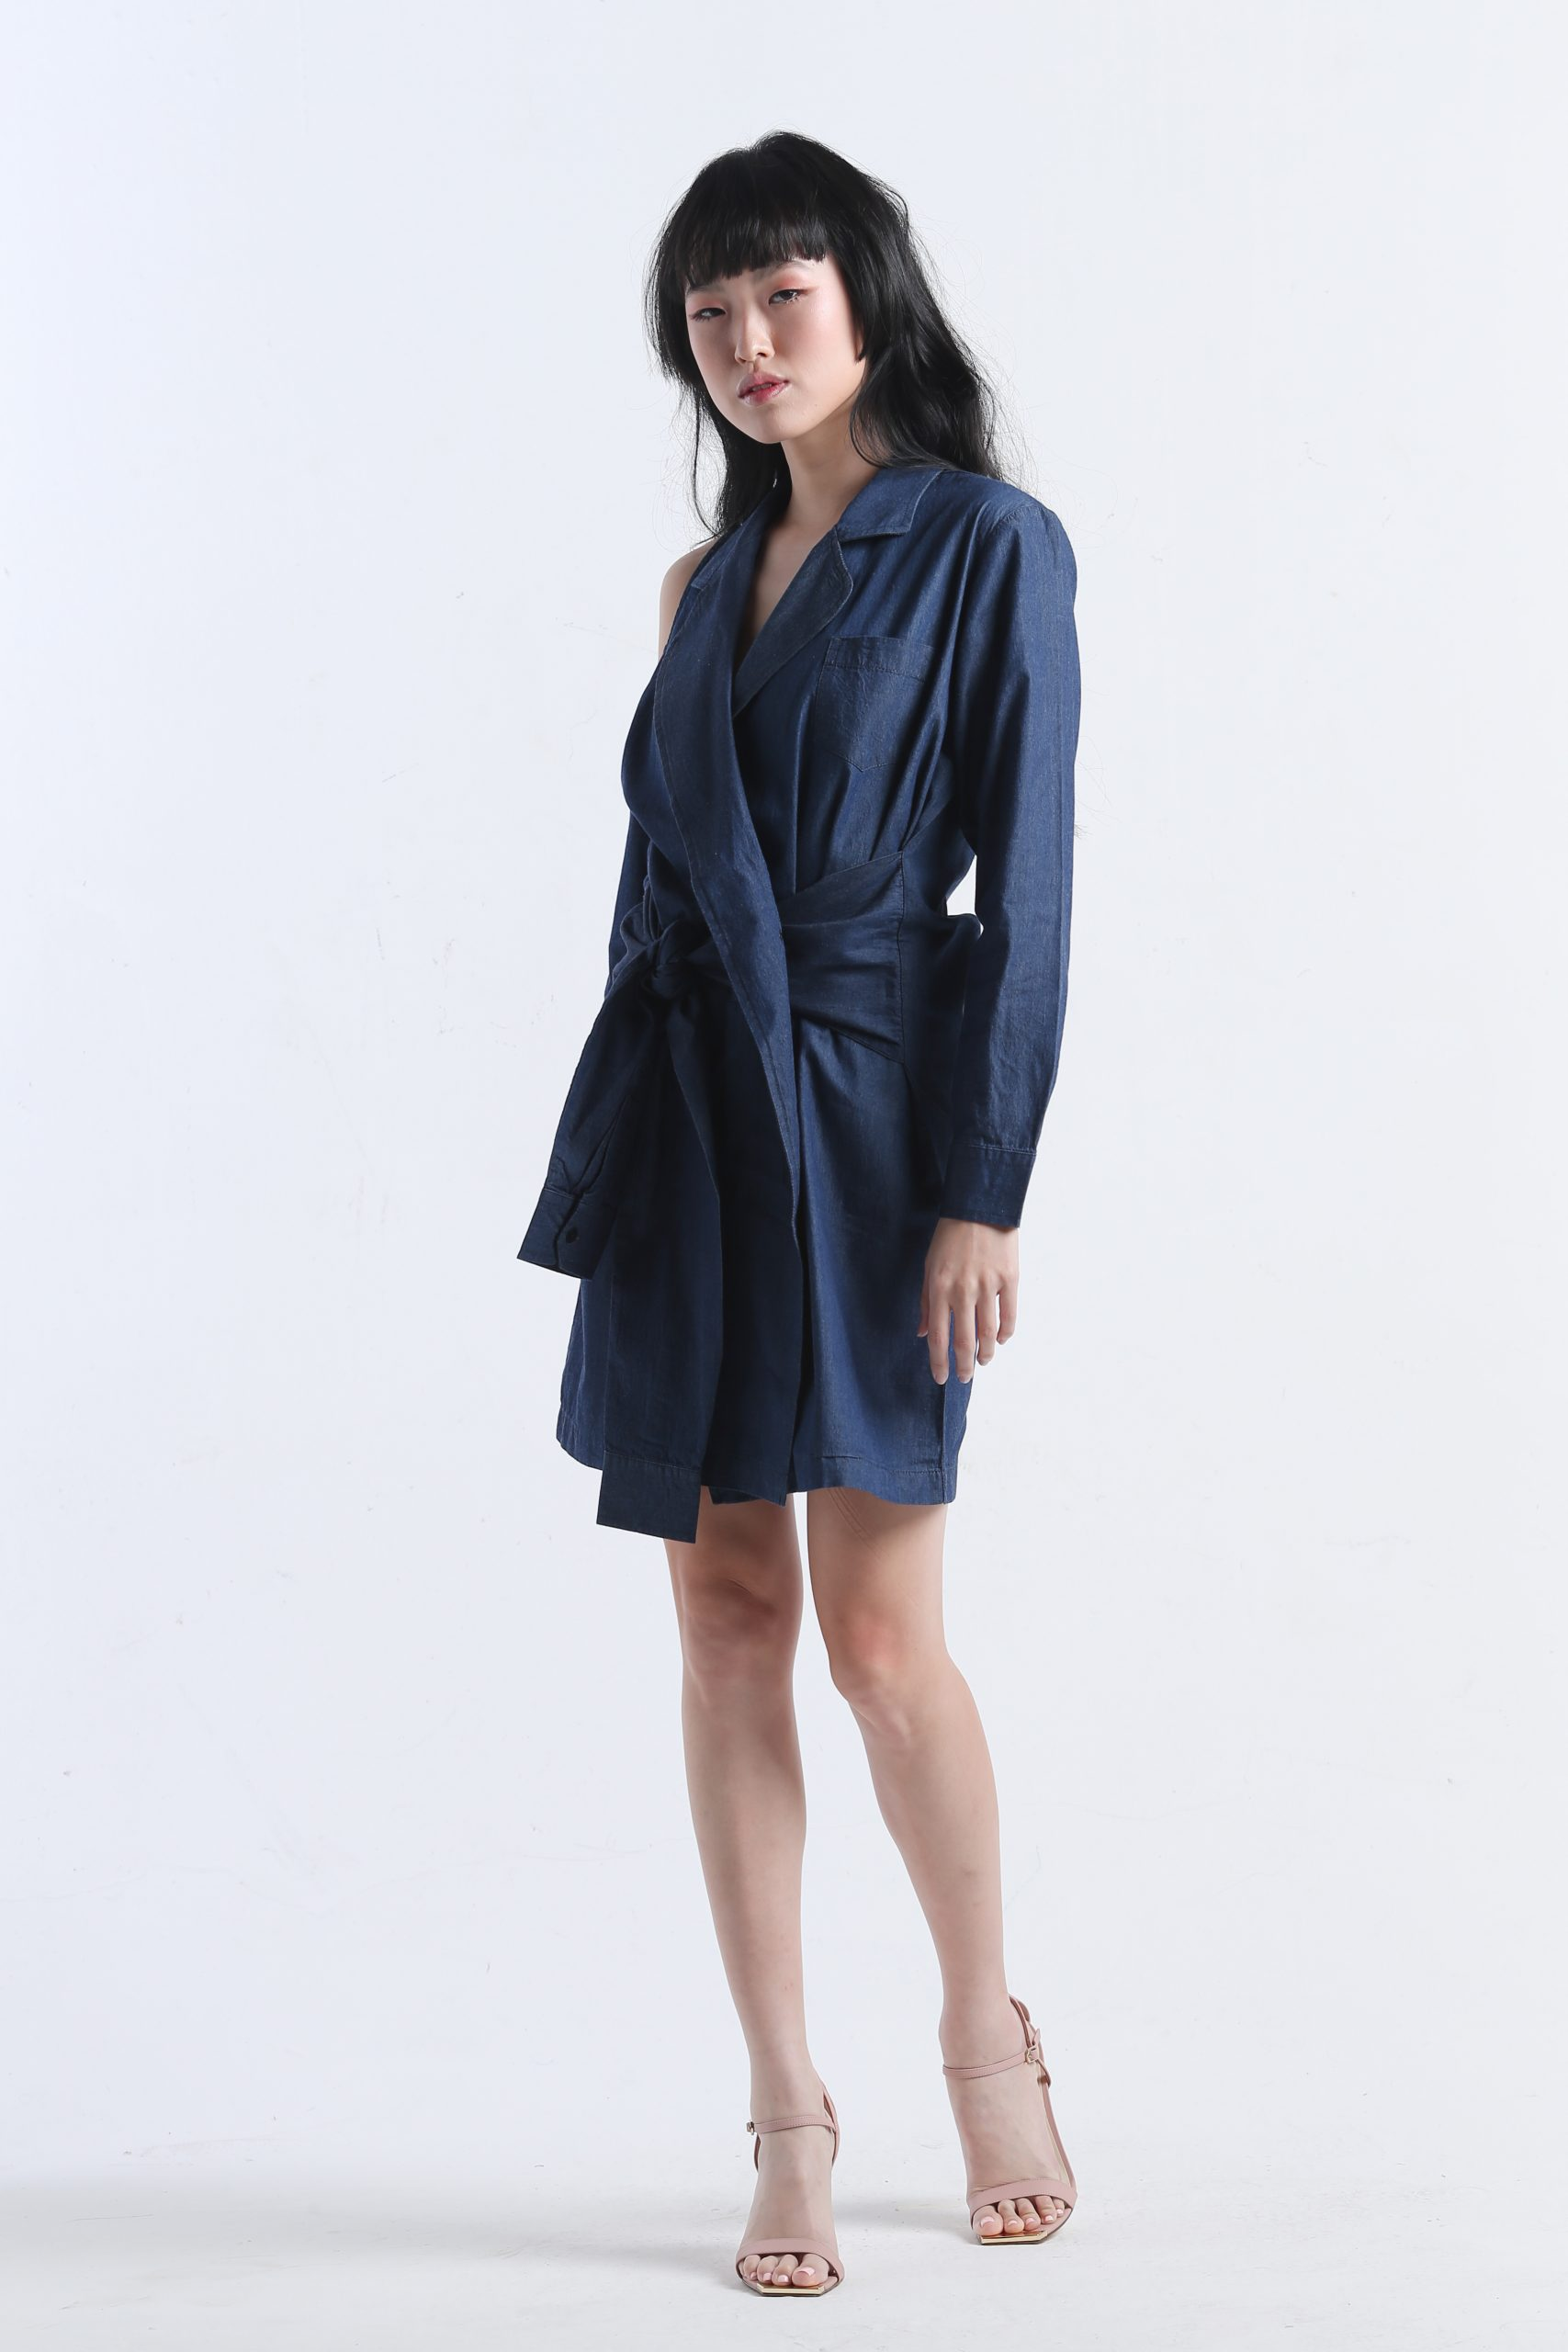 BJ JEANS Dress ผู้หญิงรุ่น EJLGF-0134